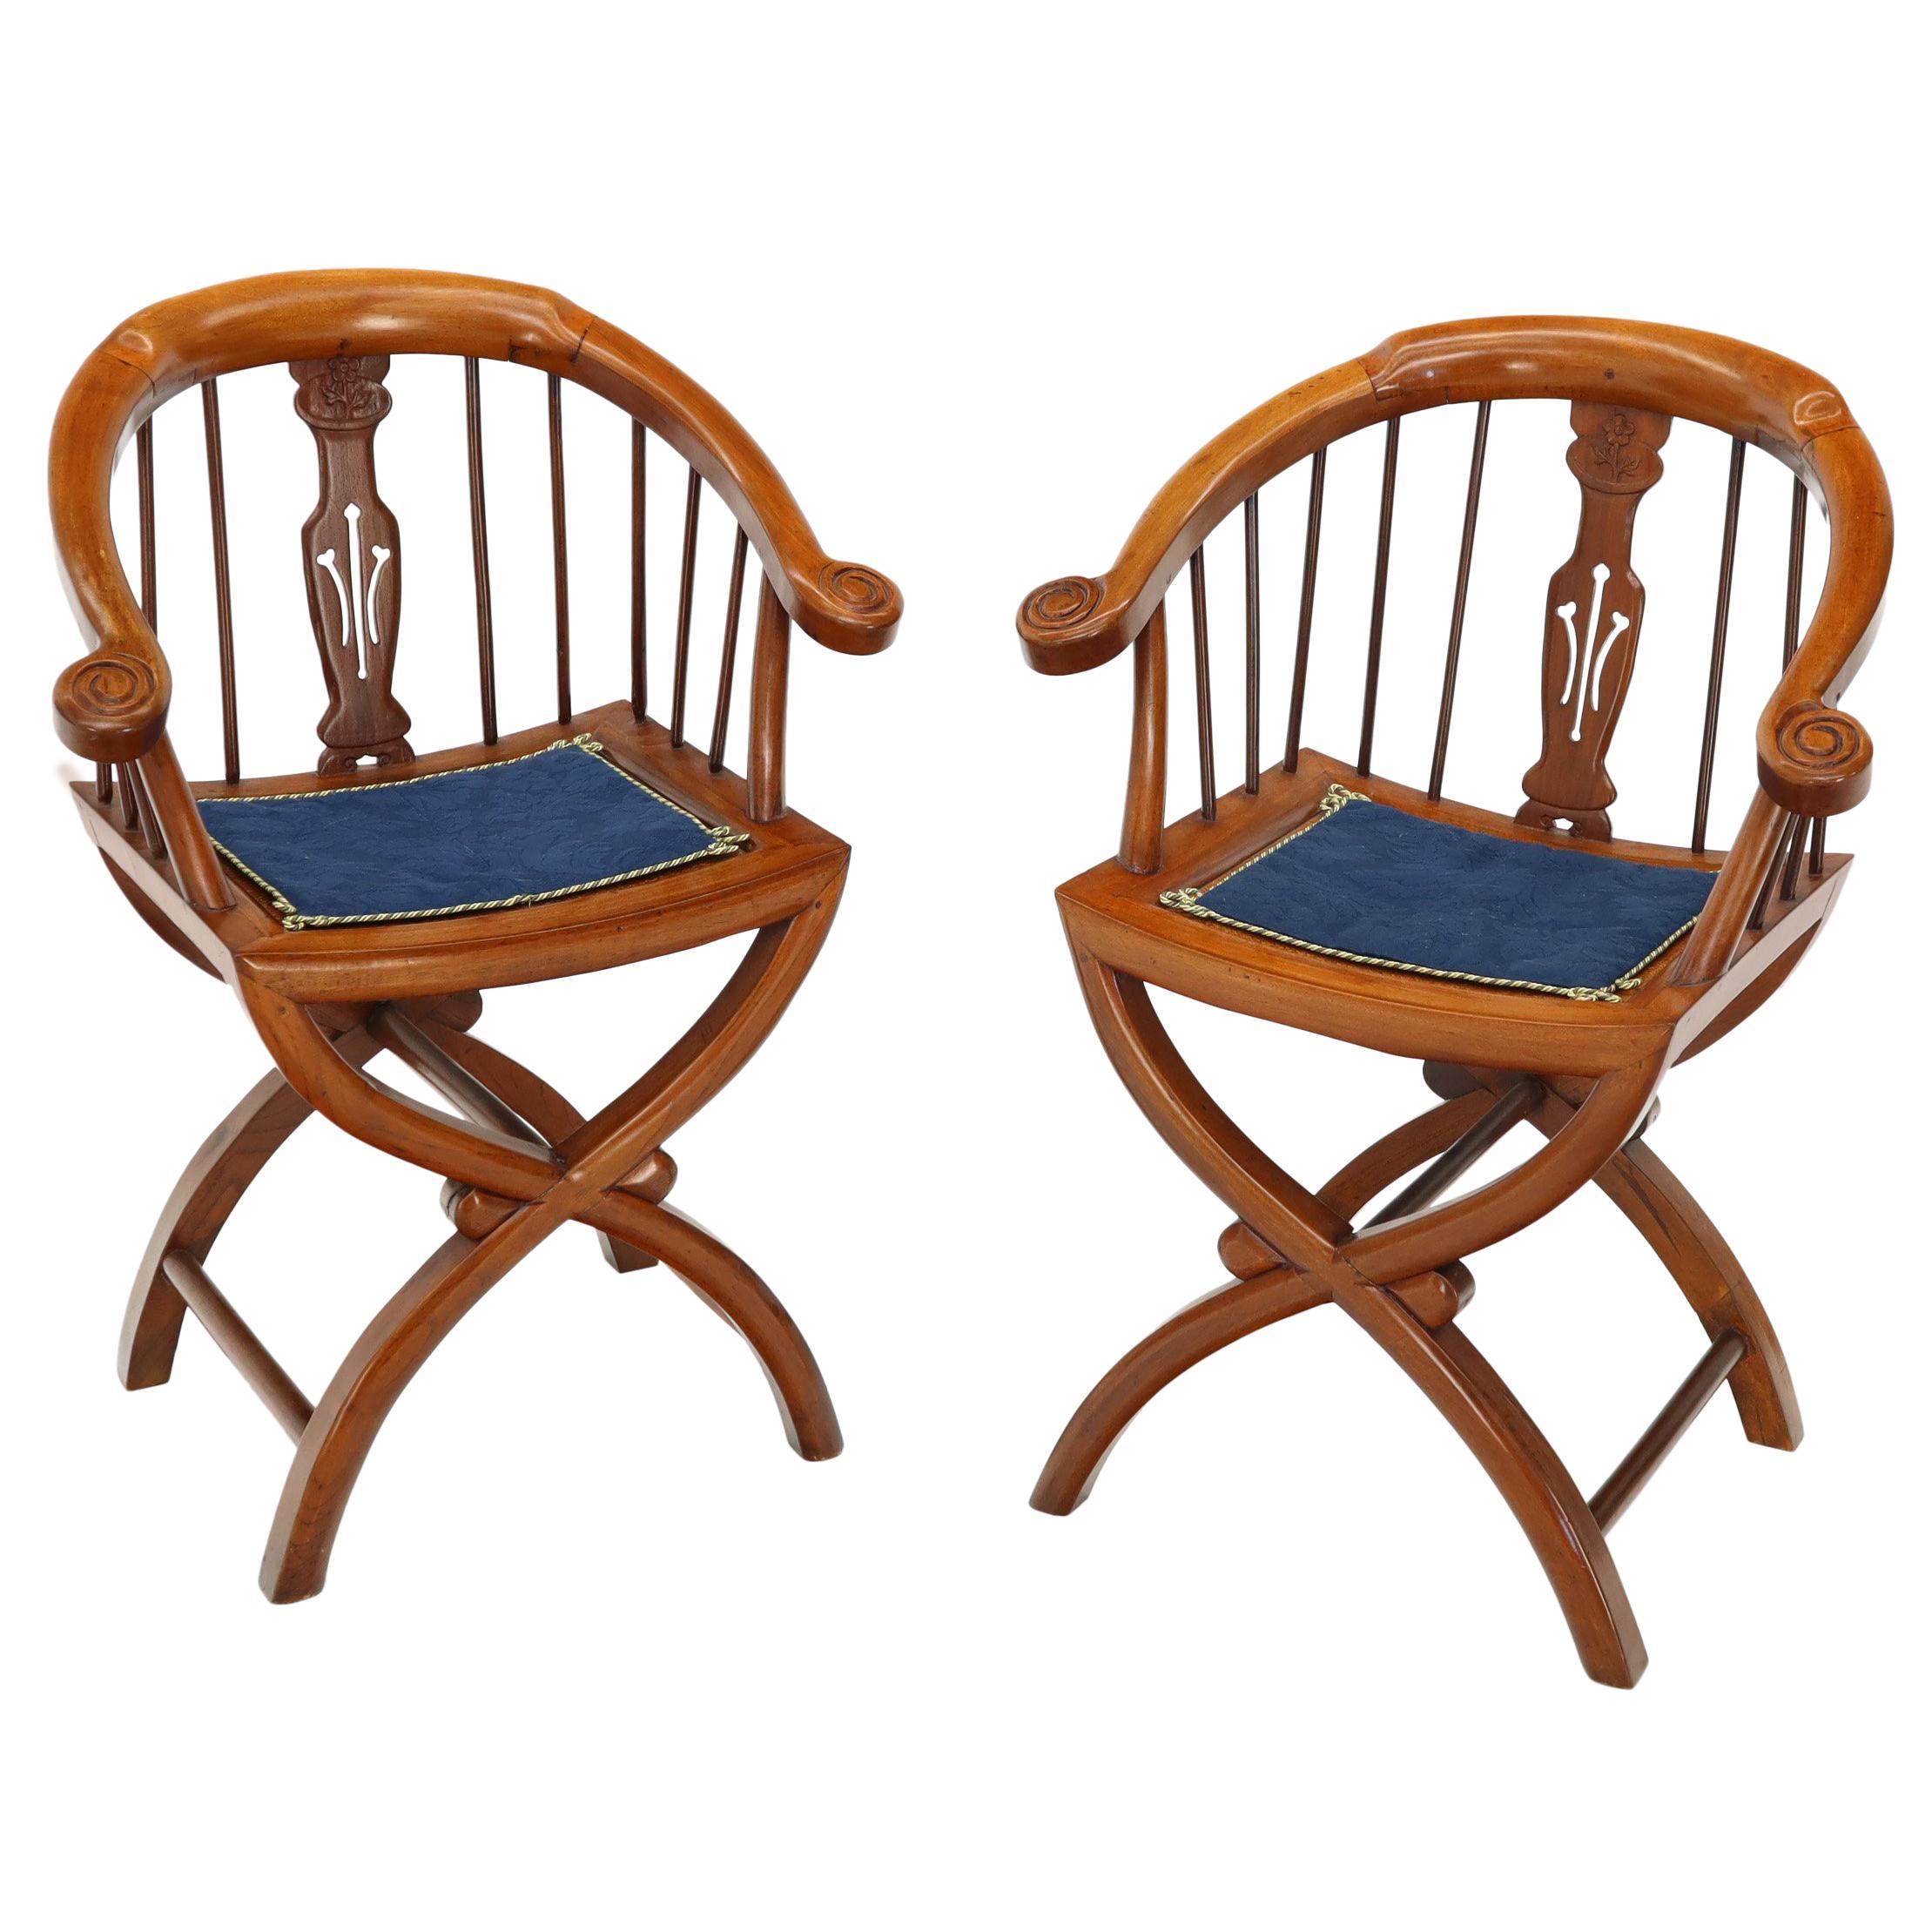 Pair of Teak Horseshoe Back Lounge Chairs